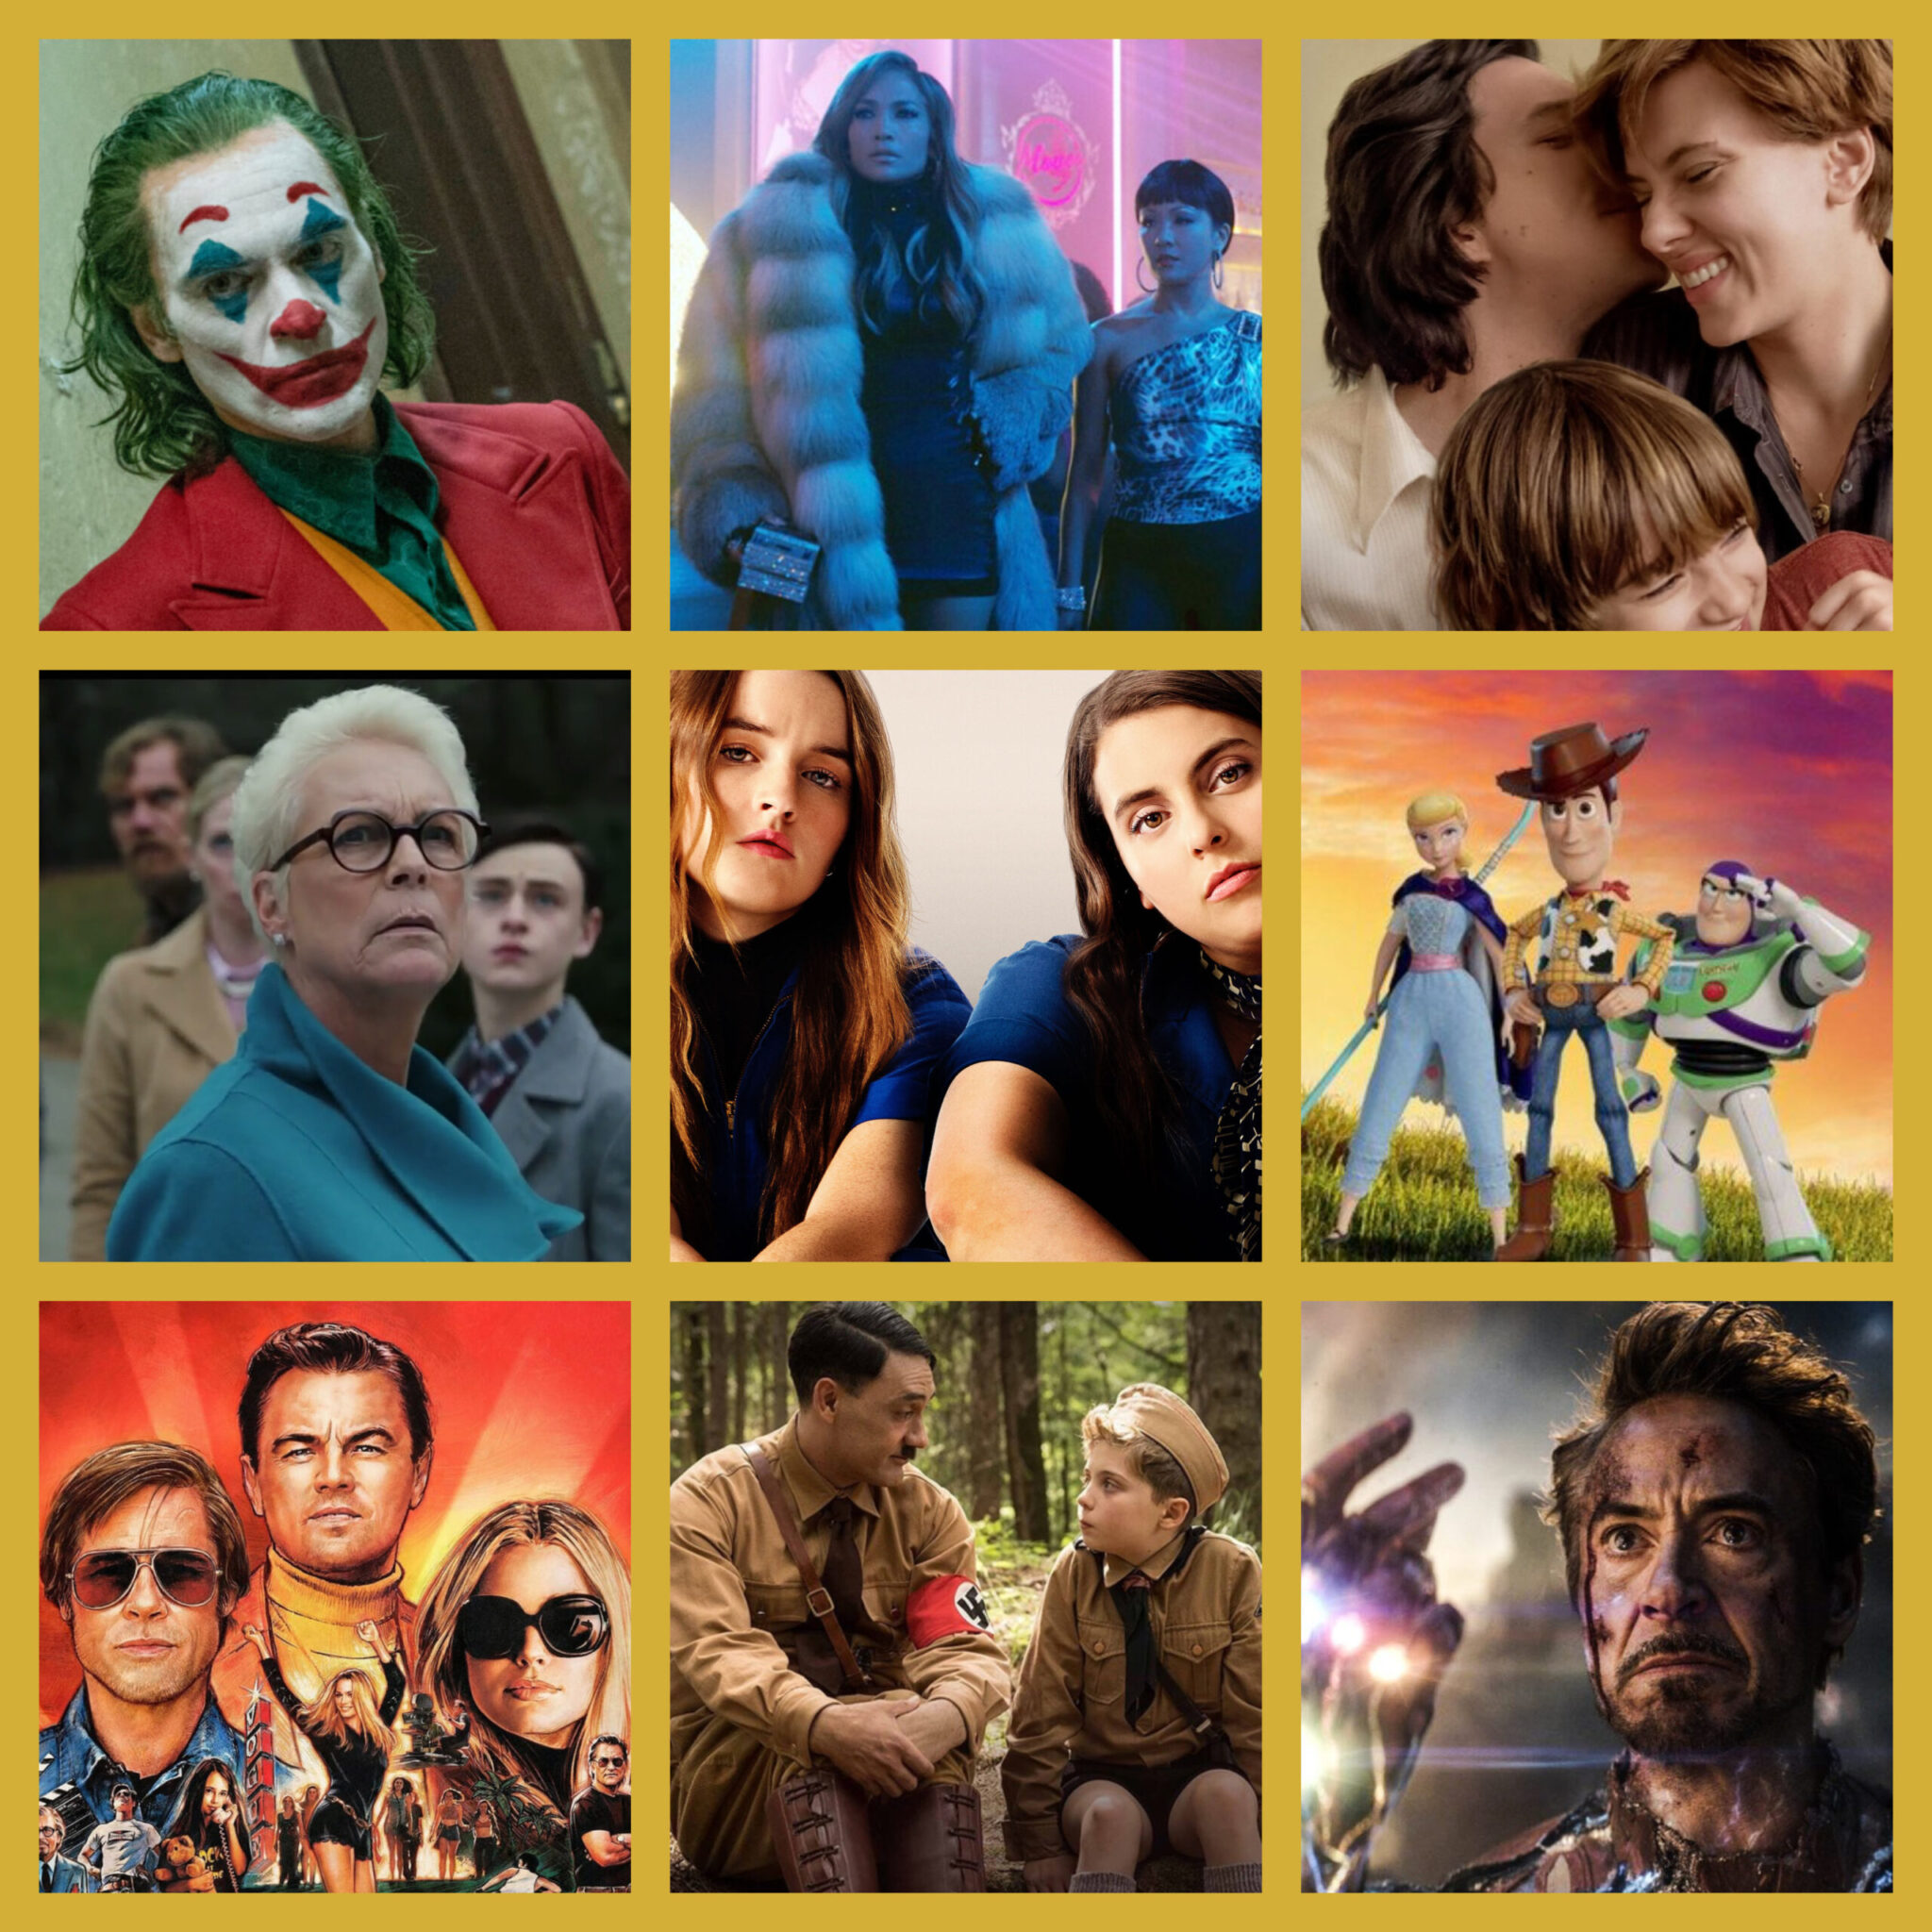 Jazz Tangcay's Nine Favorite Films of 2019